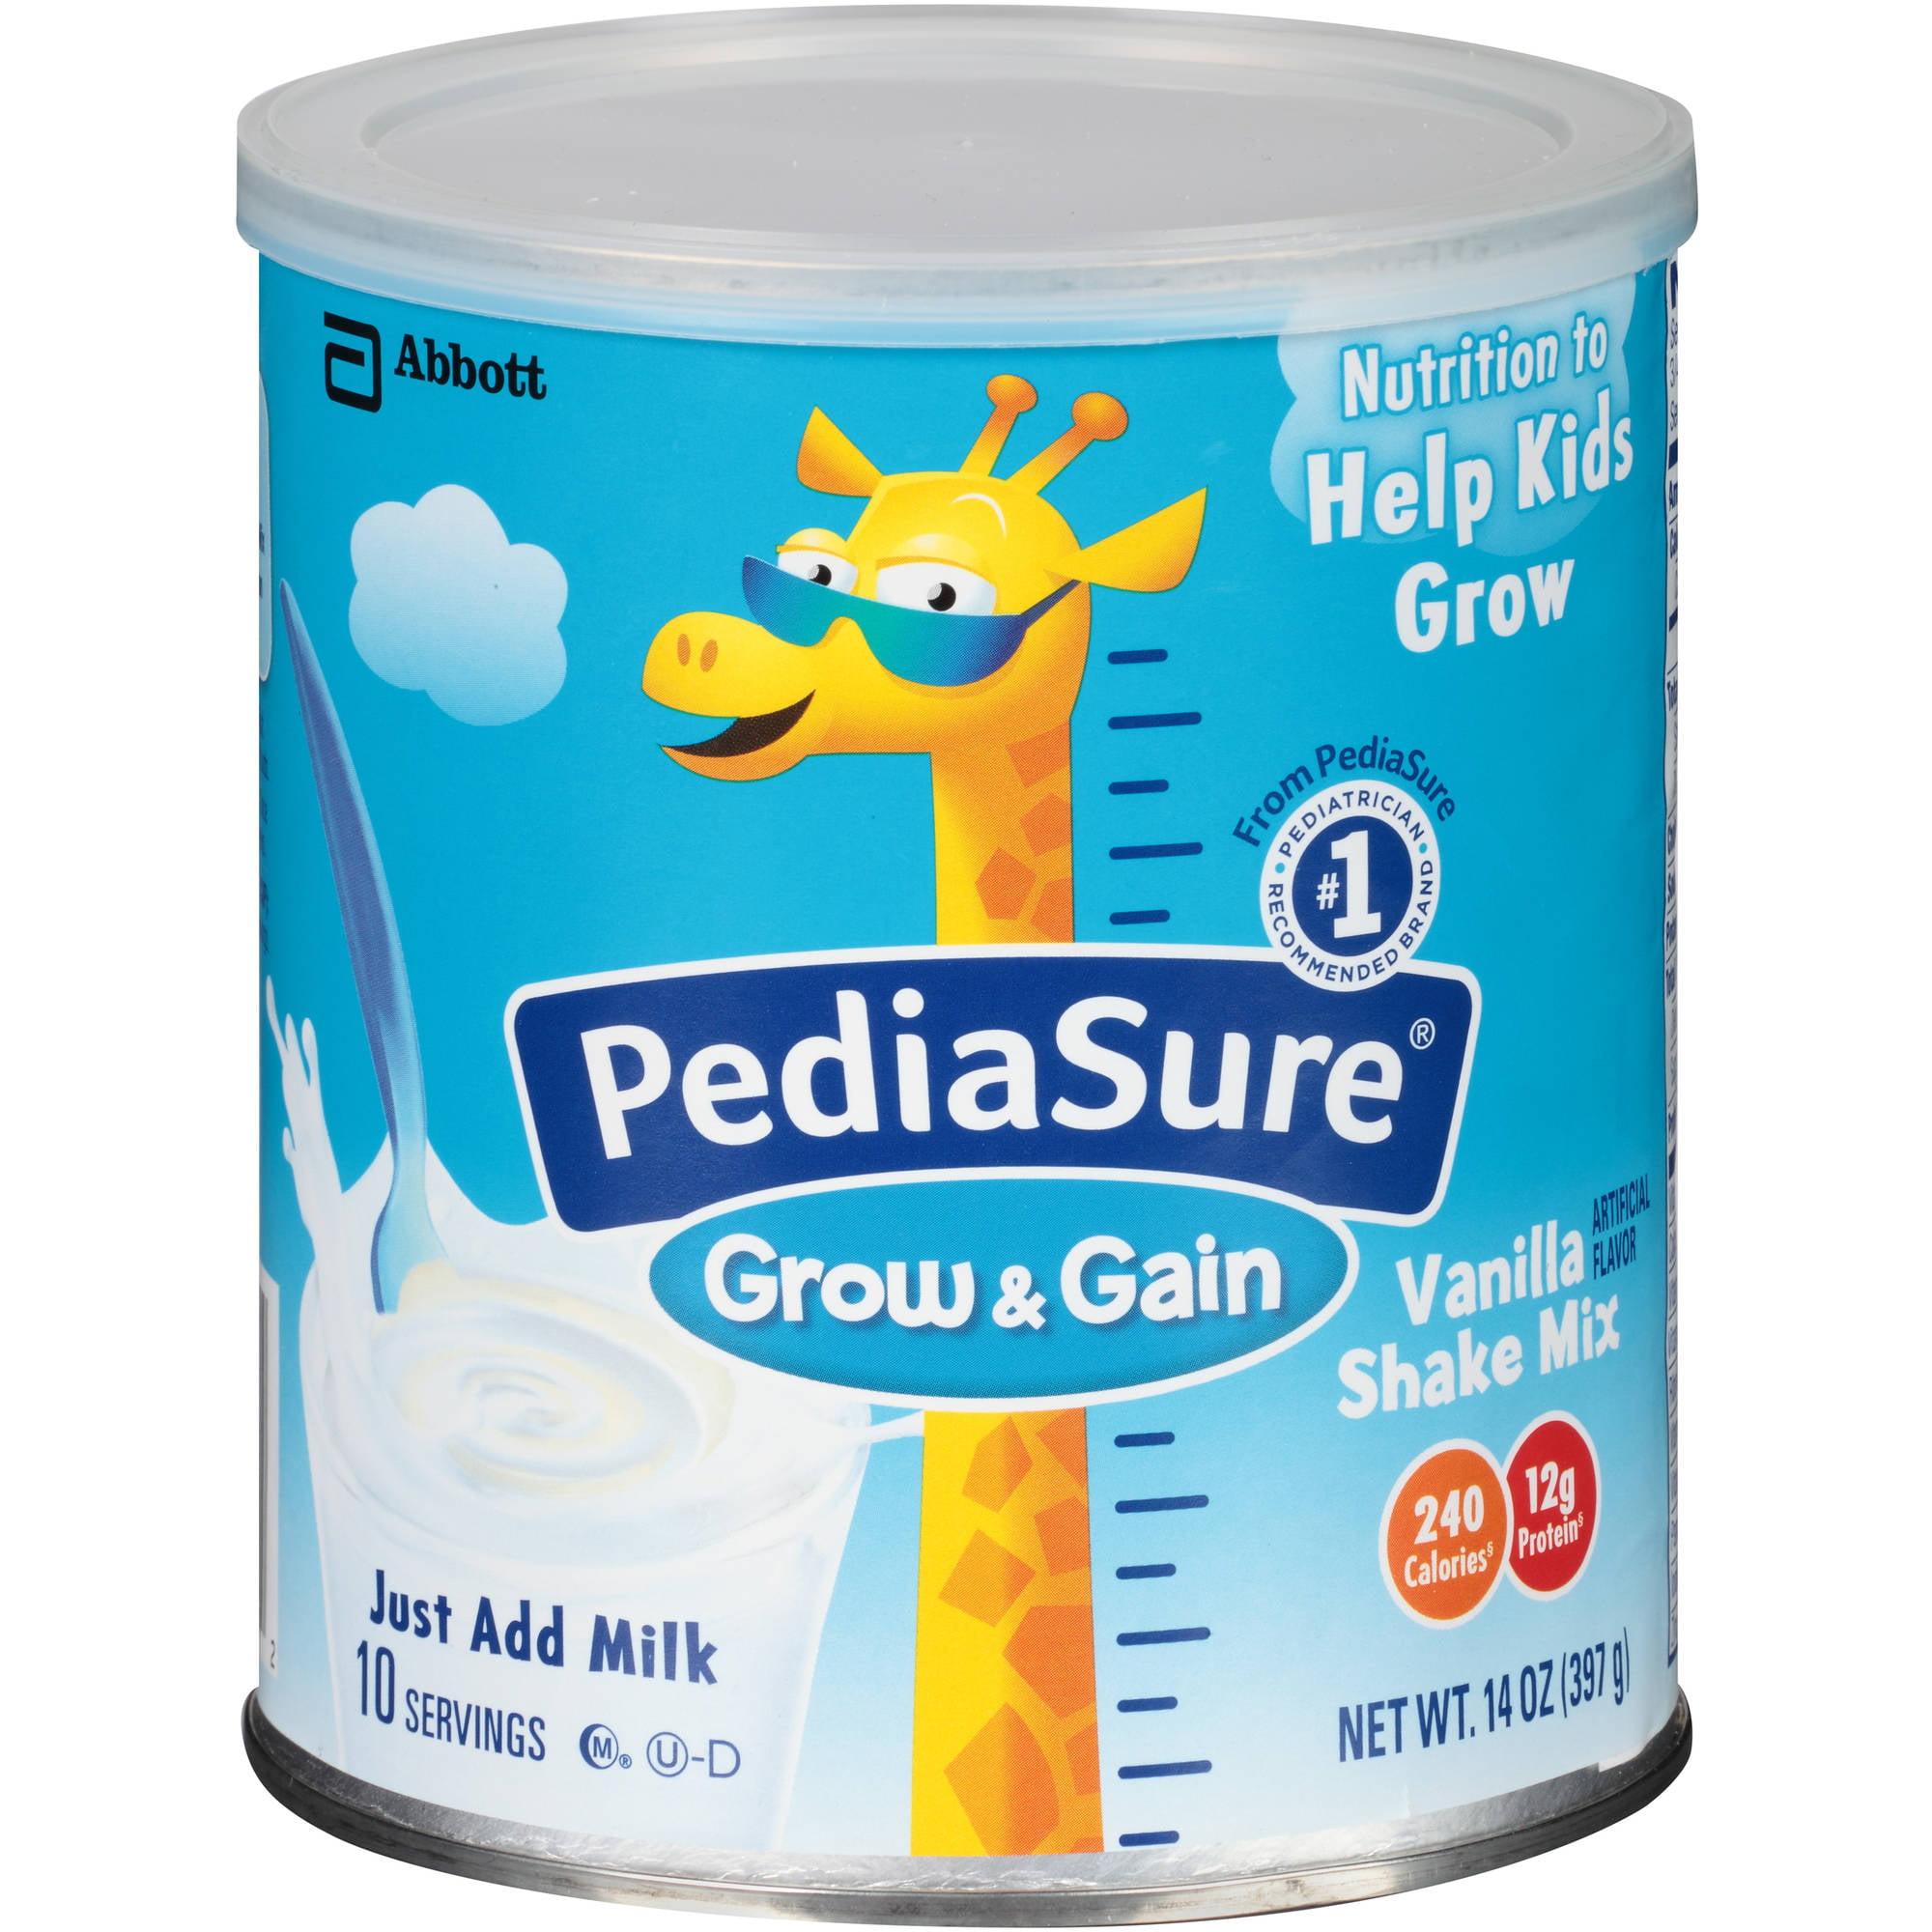 PediaSure Shake Mix, Vanilla, 14oz powder canister